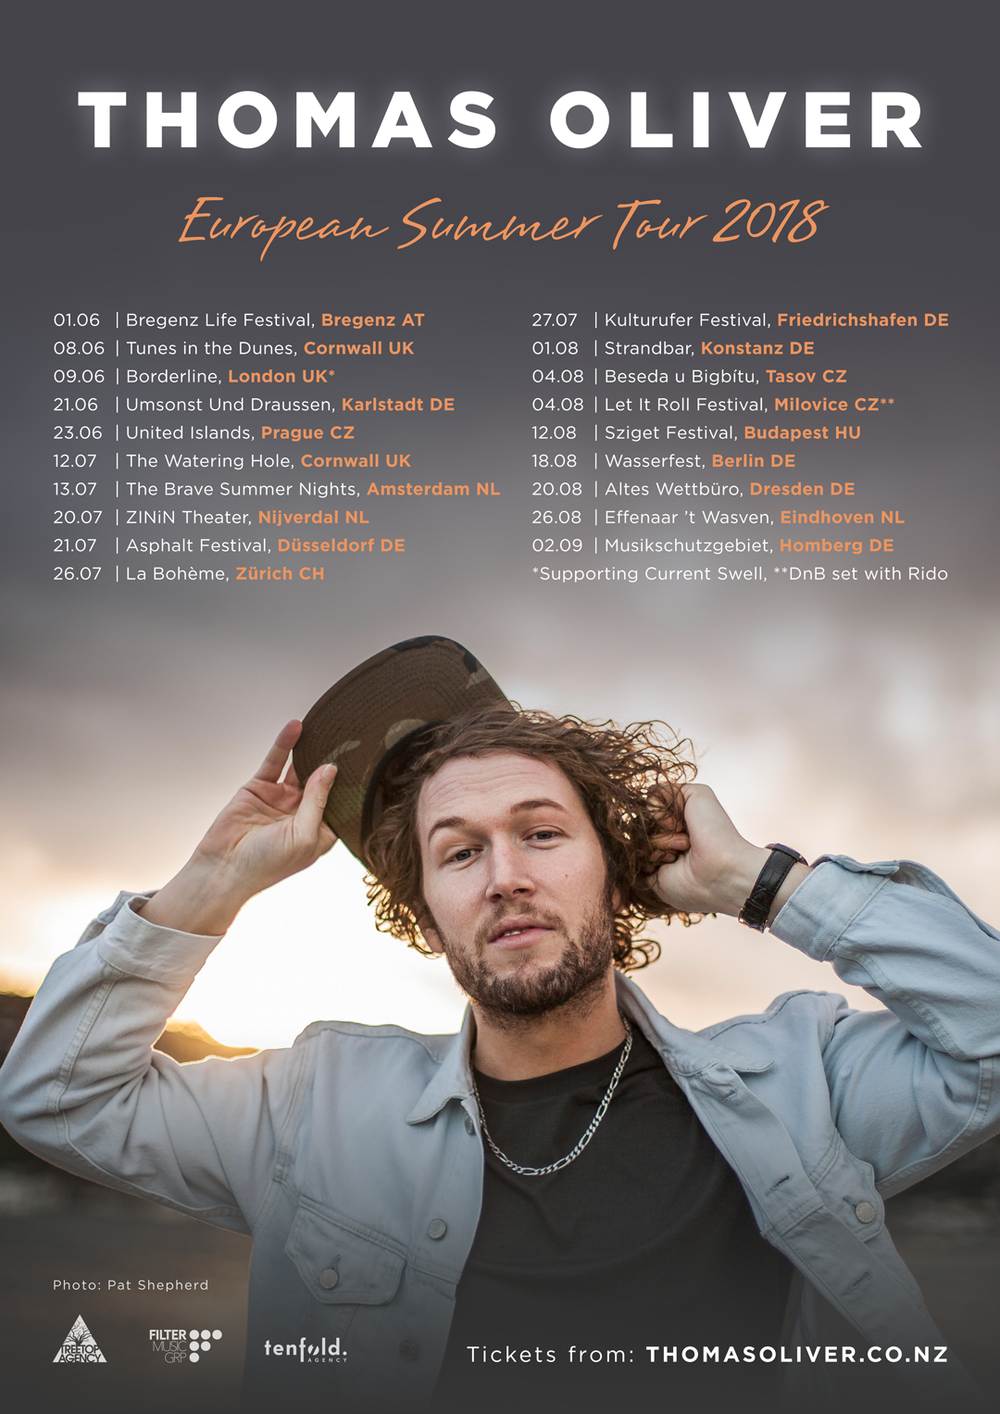 Thomas Oliver European Summer Tour 2018.png